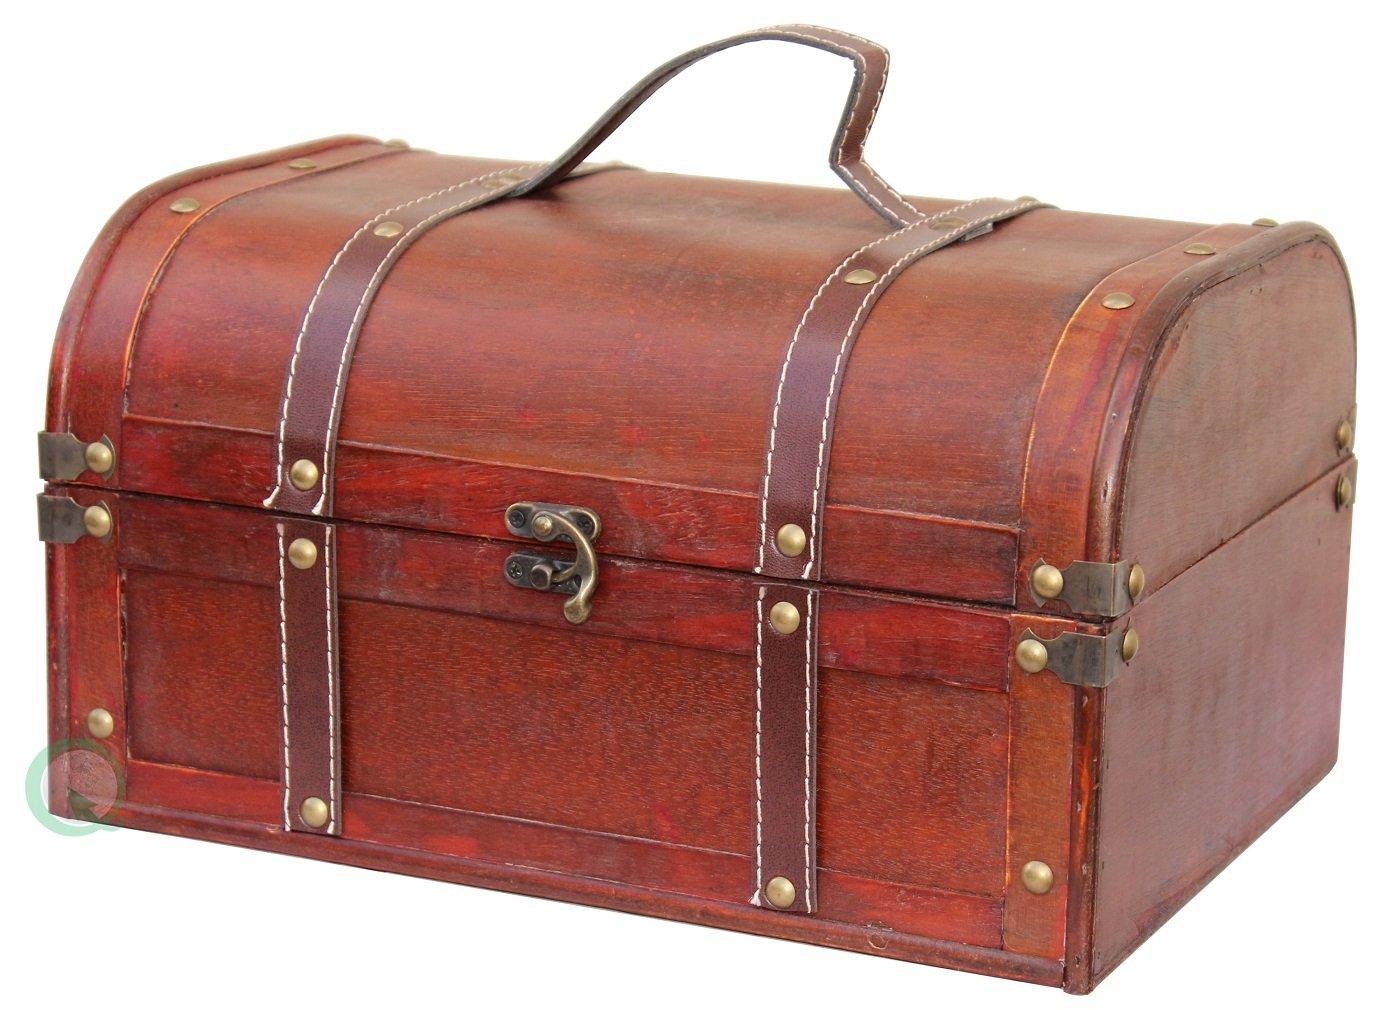 Vintiquewise(TM Decorative Wood Treasure Box - Wooden Trunk Chest by Vintiquewise